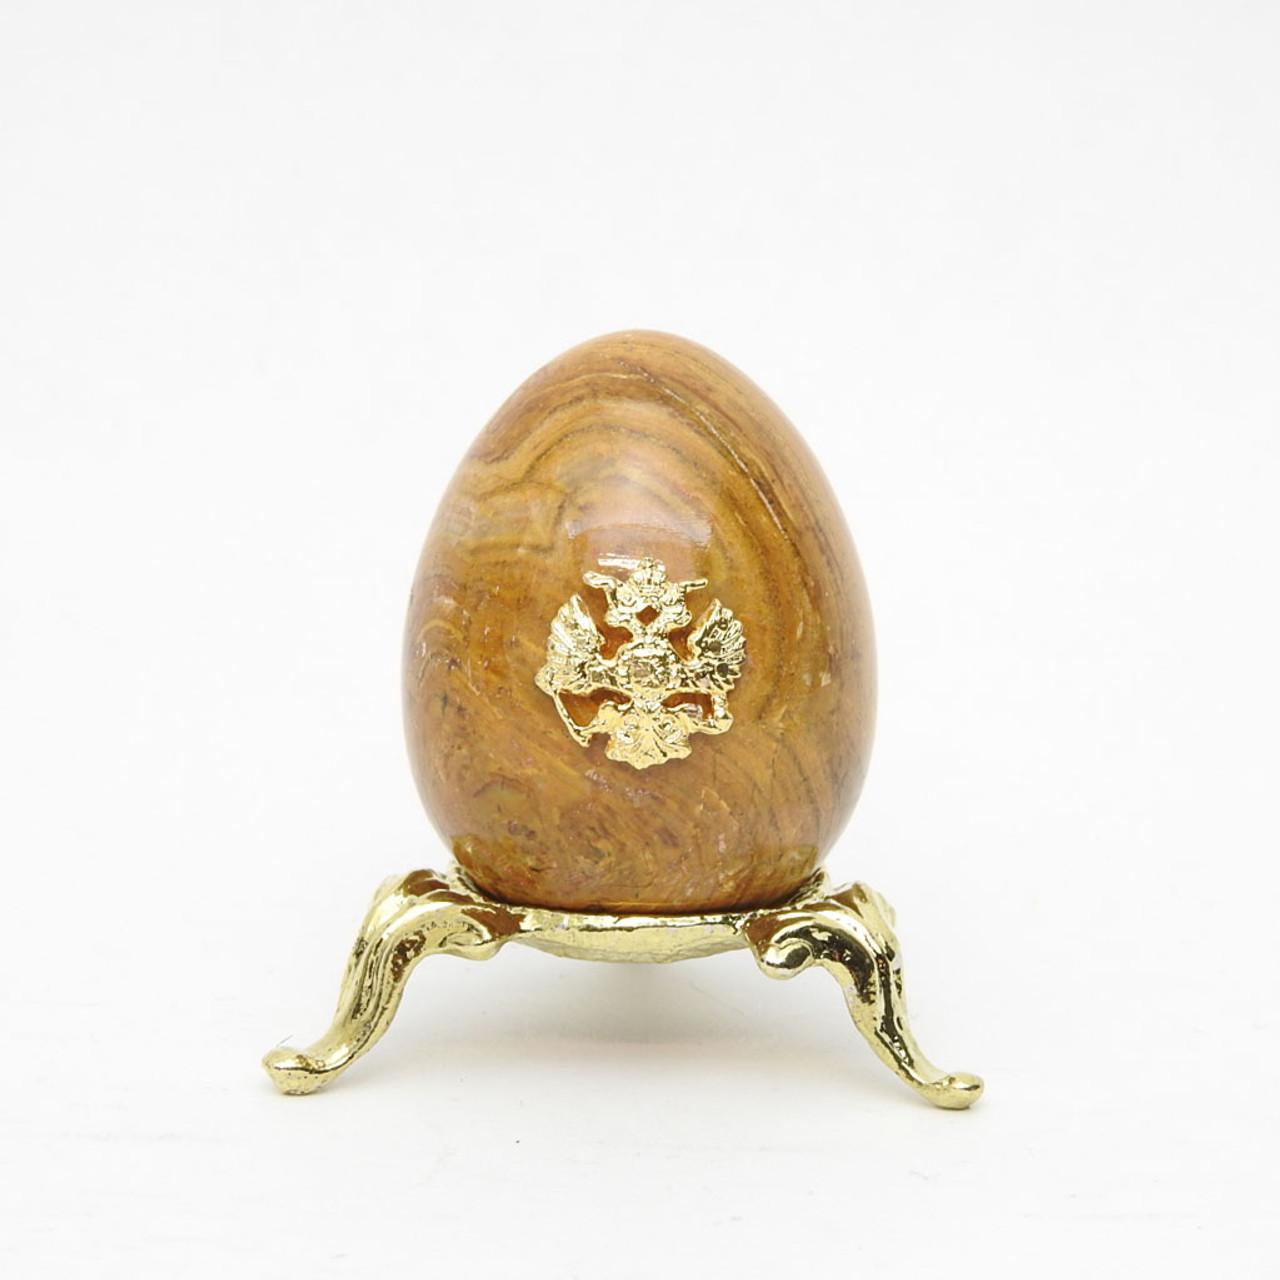 Imperial Russian Eagle Egg 25